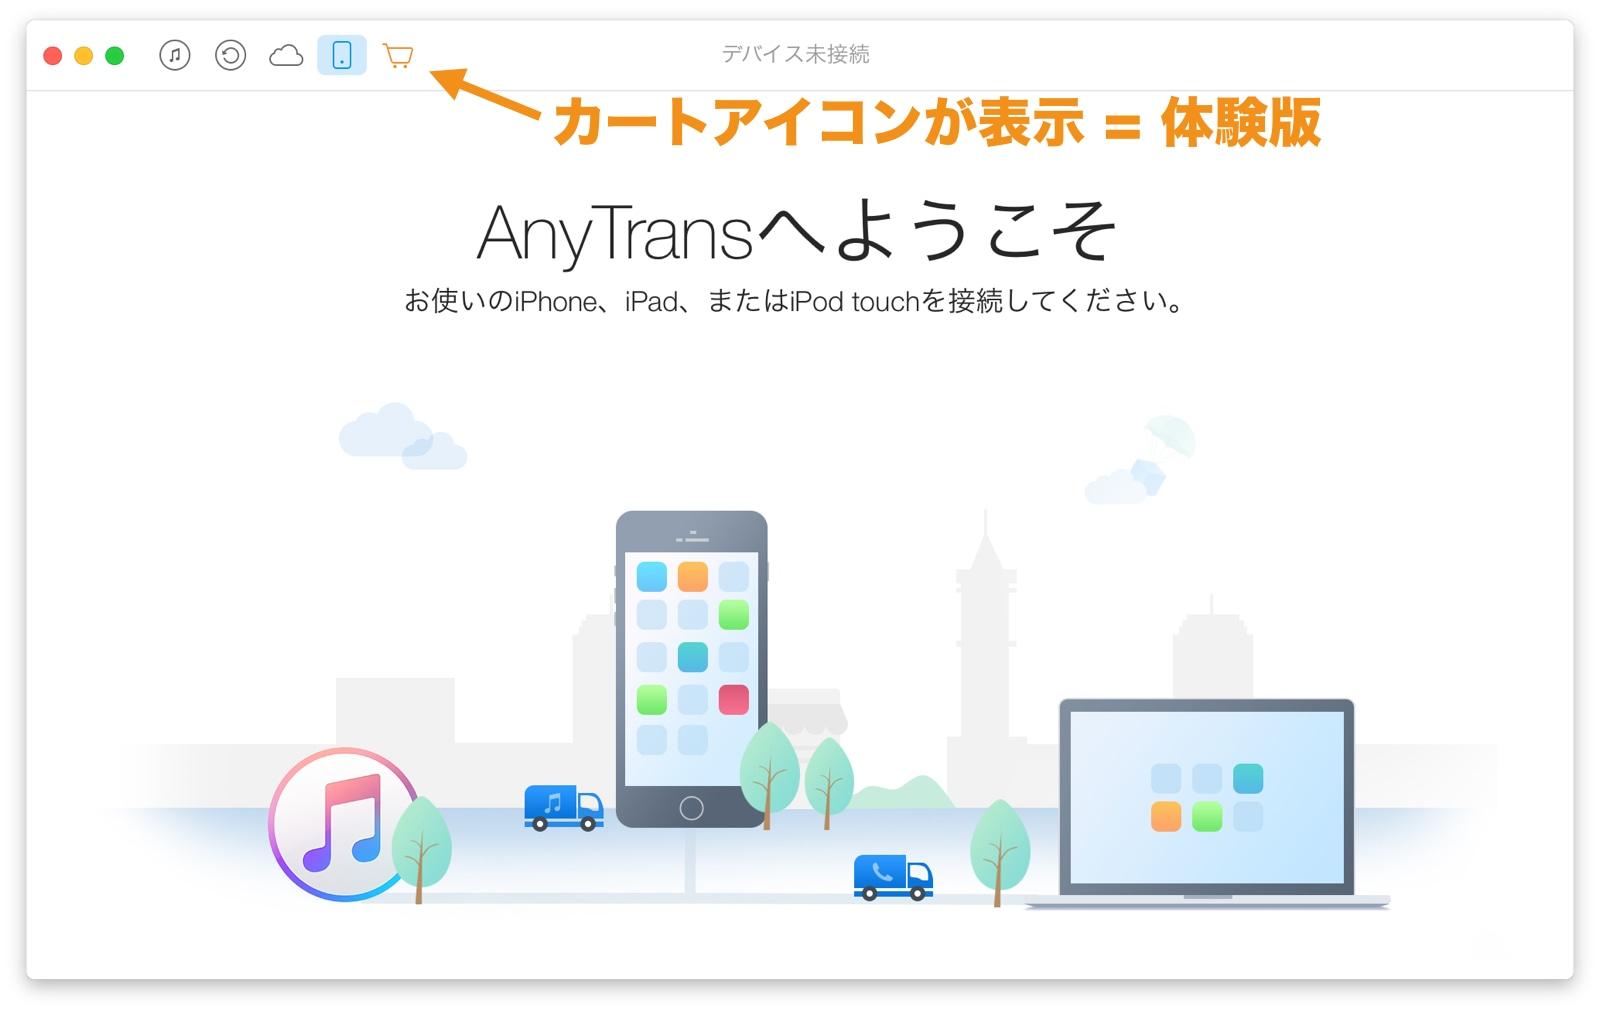 AnyTrans Windows インストール方法 ライセンス認証